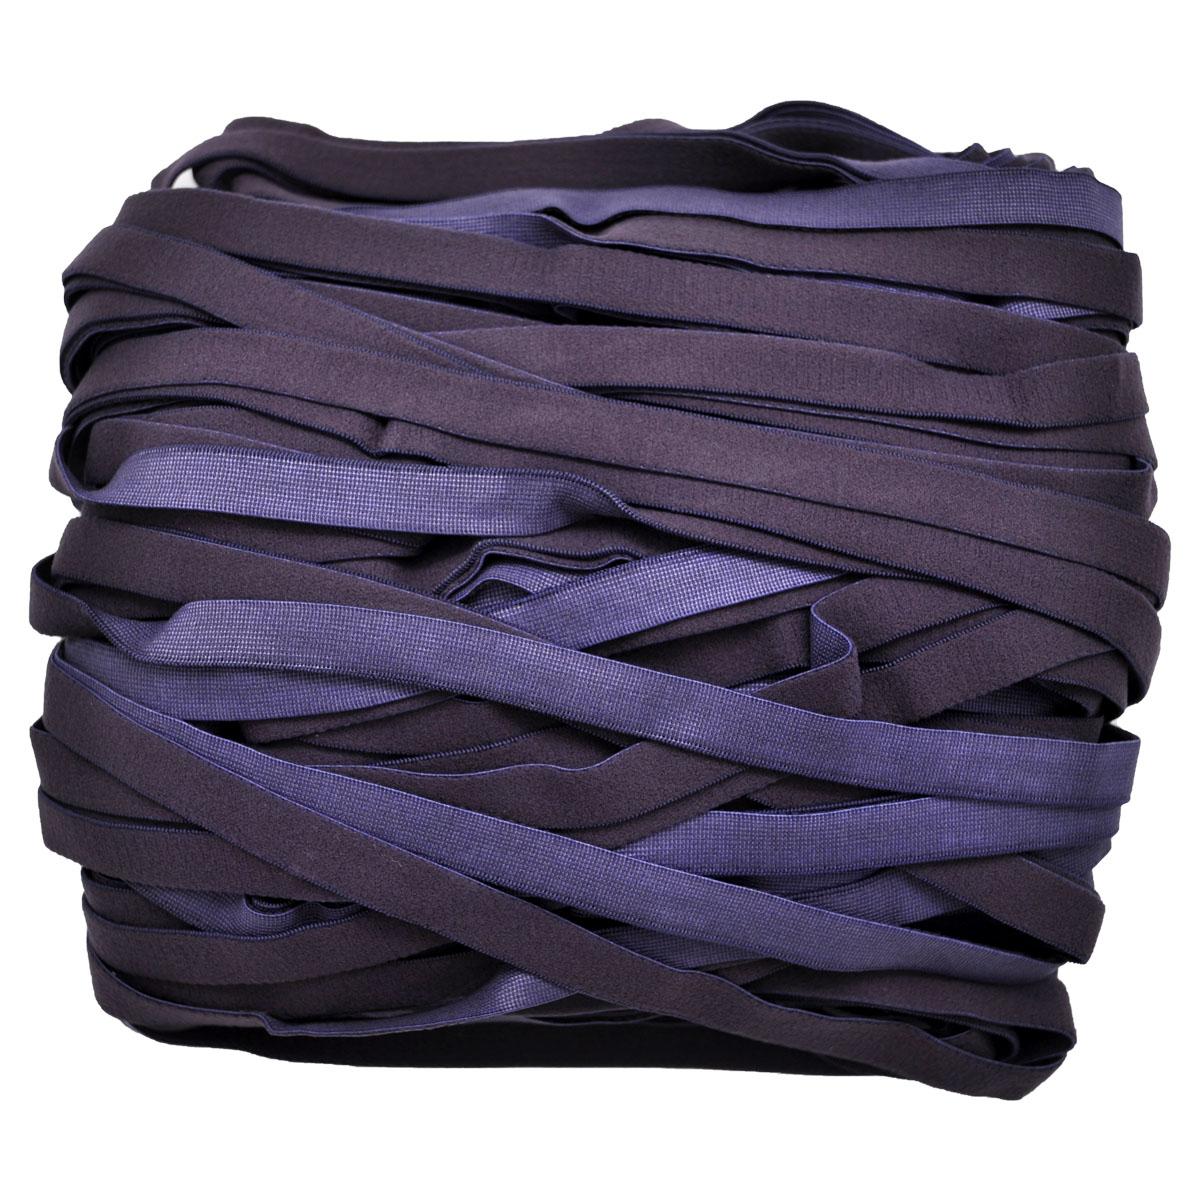 STP/20 эластичная отделочная лента 12мм*50м, фиолетовый